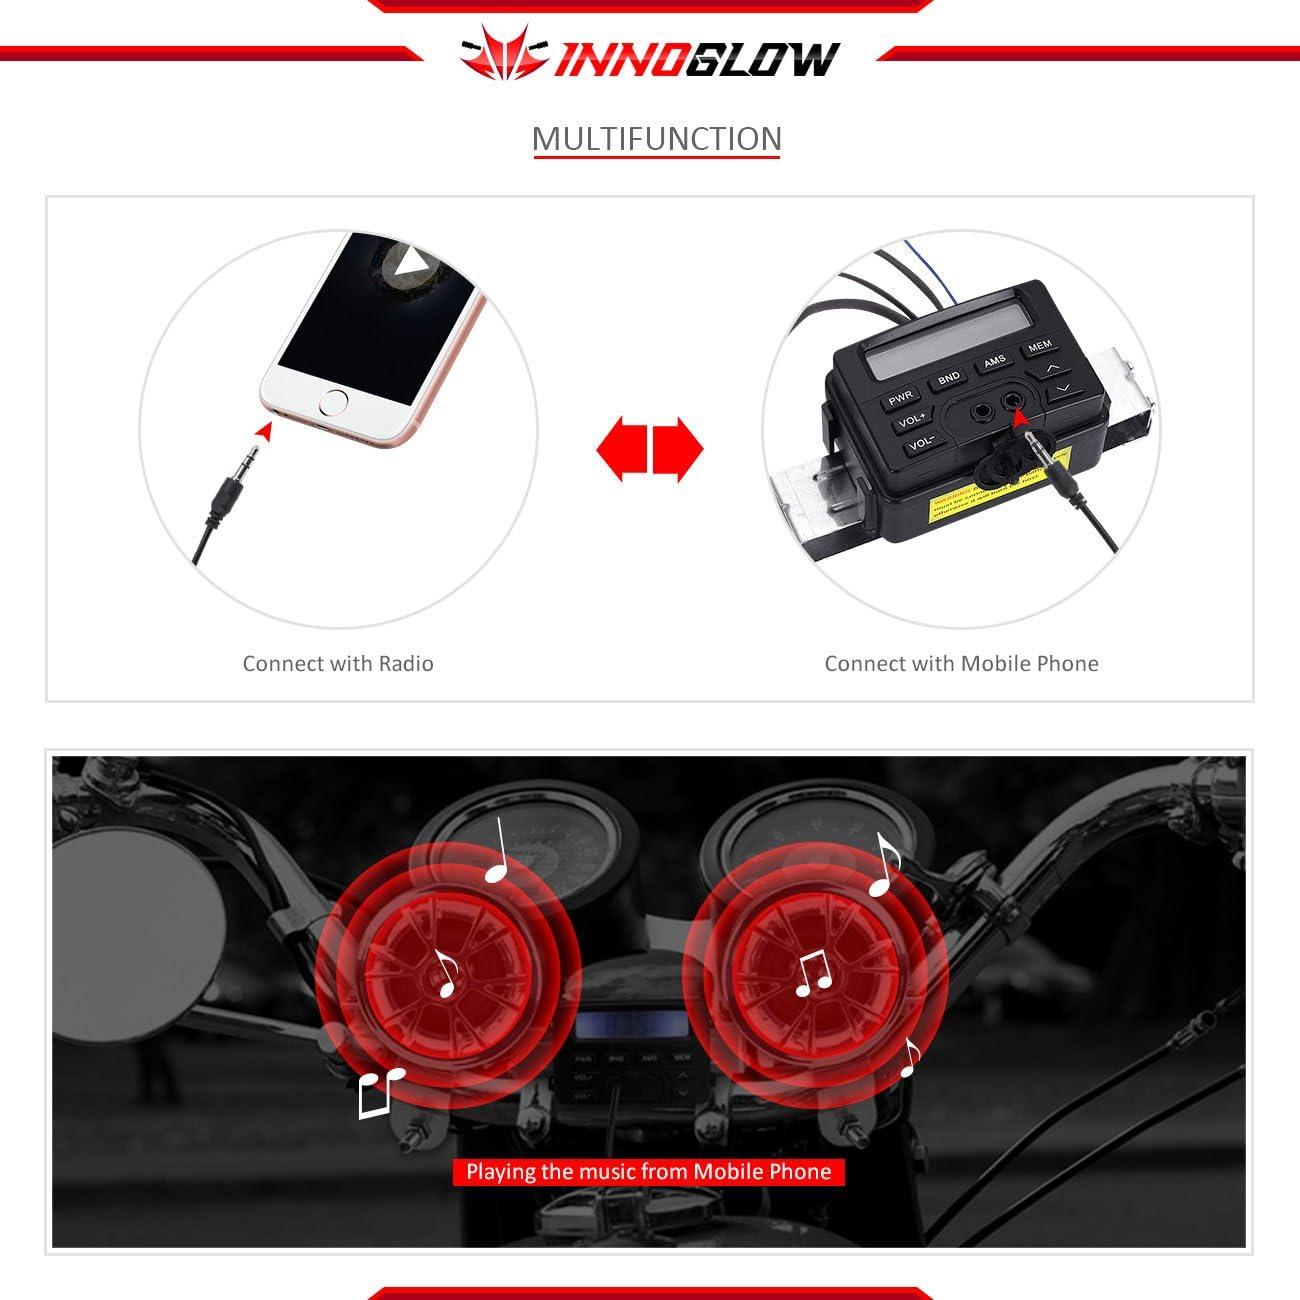 INNOGLOW Motorcycle Stereo Speakers Waterproof Handlebar Mount MP3 Music Player Audio Radio Amplifier System for Honda VT ATV Shadow Spirit Velorex Deluxe 600 750 1100